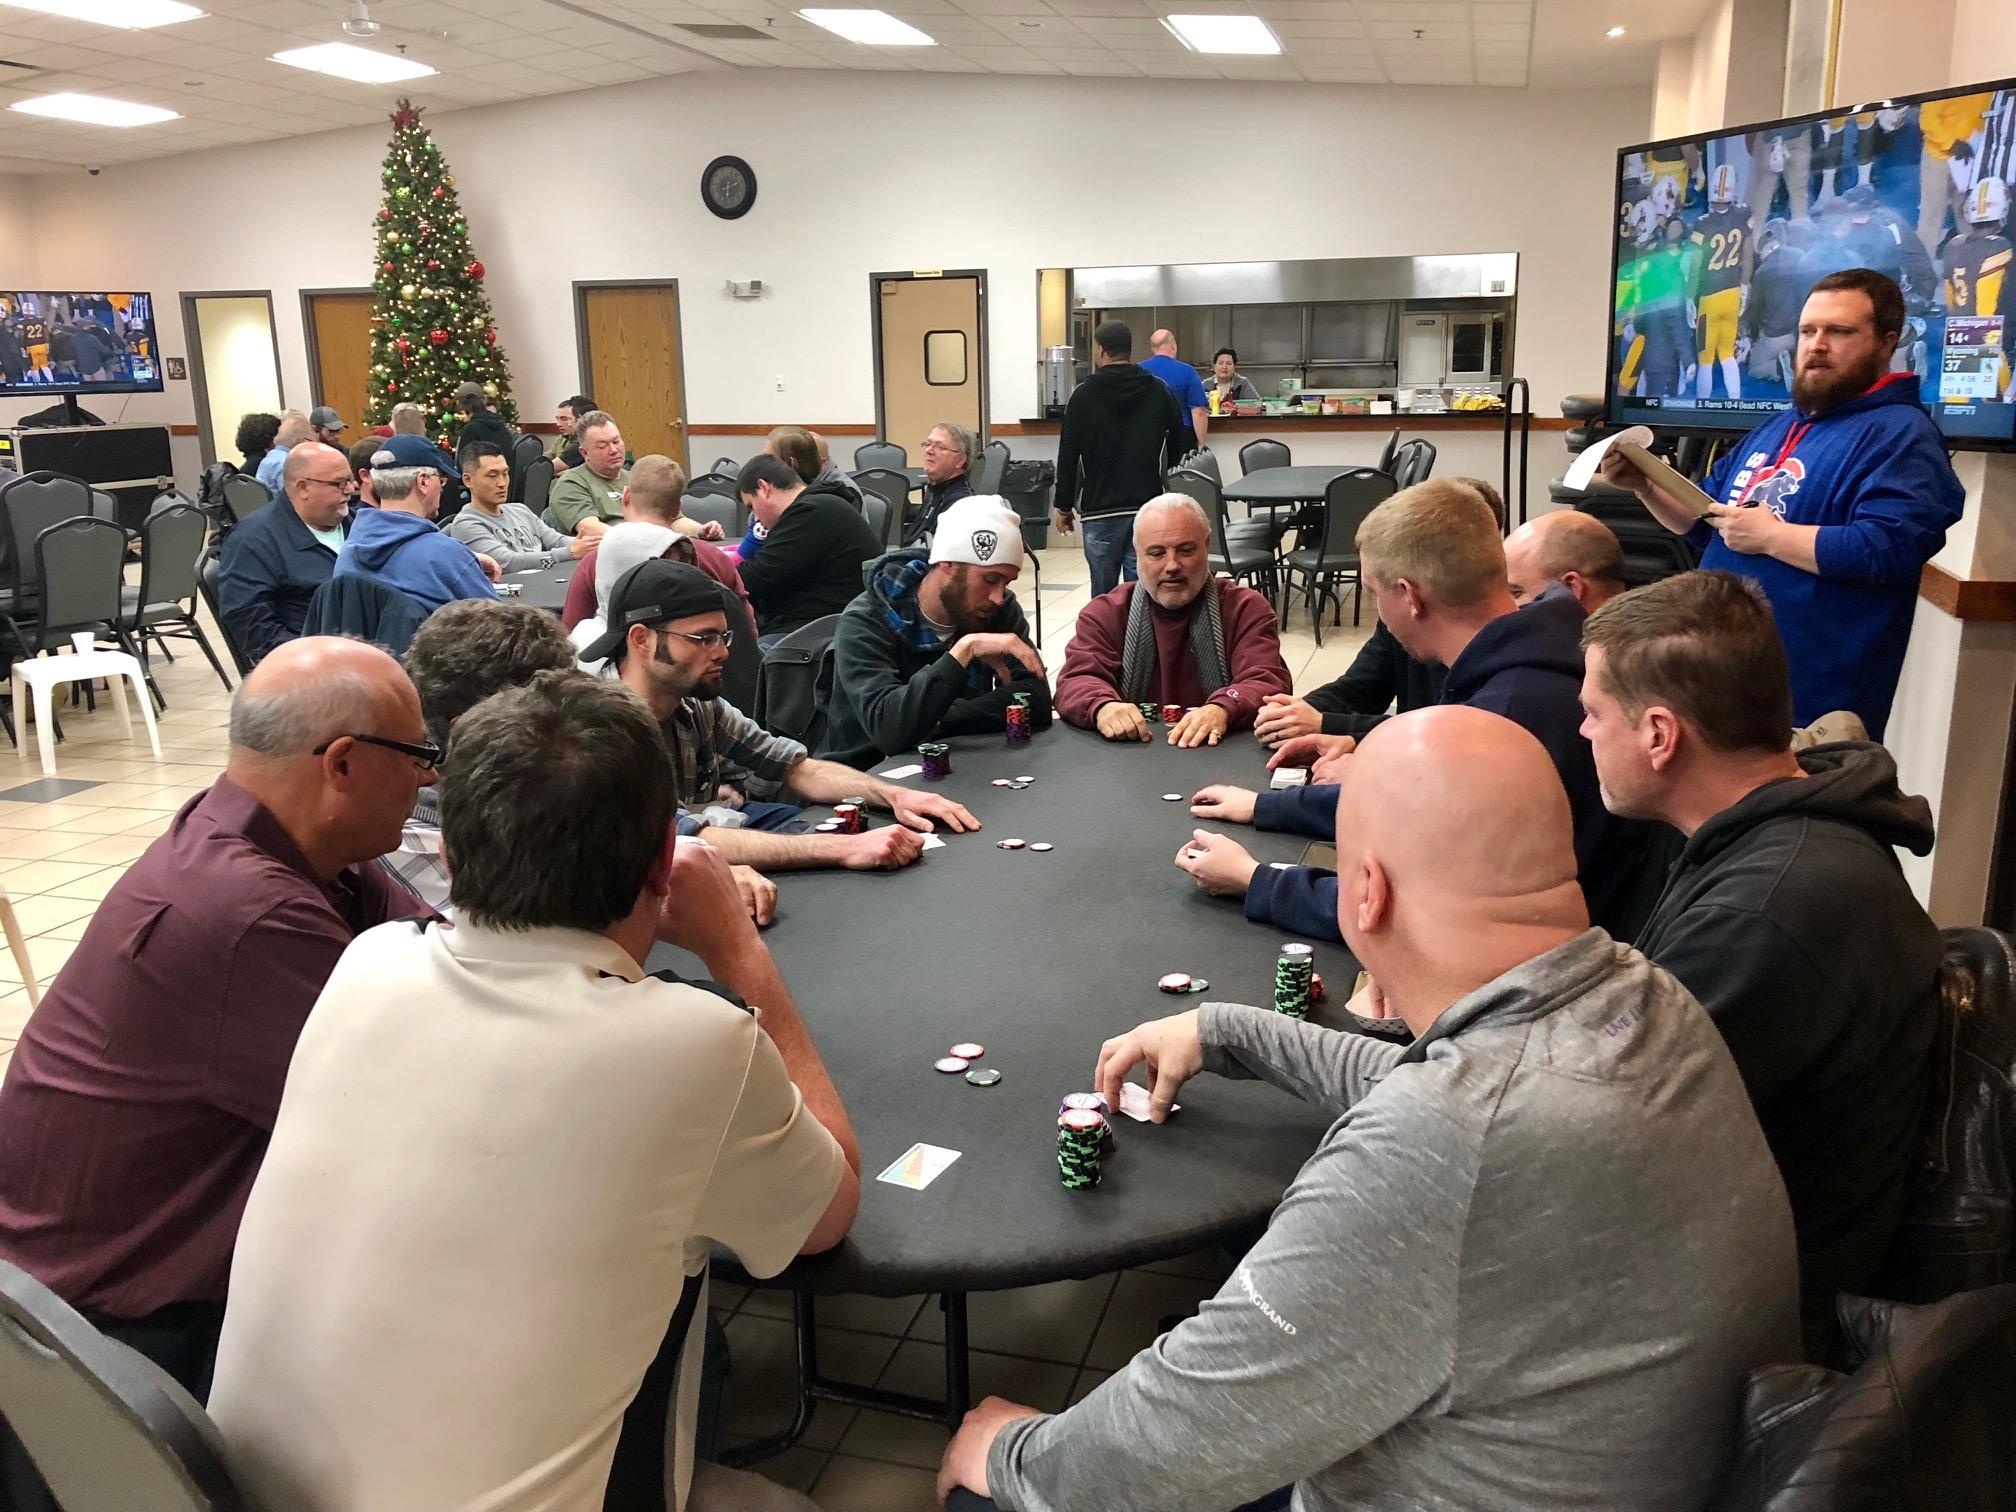 Poker rockford il code promotionnel poker star